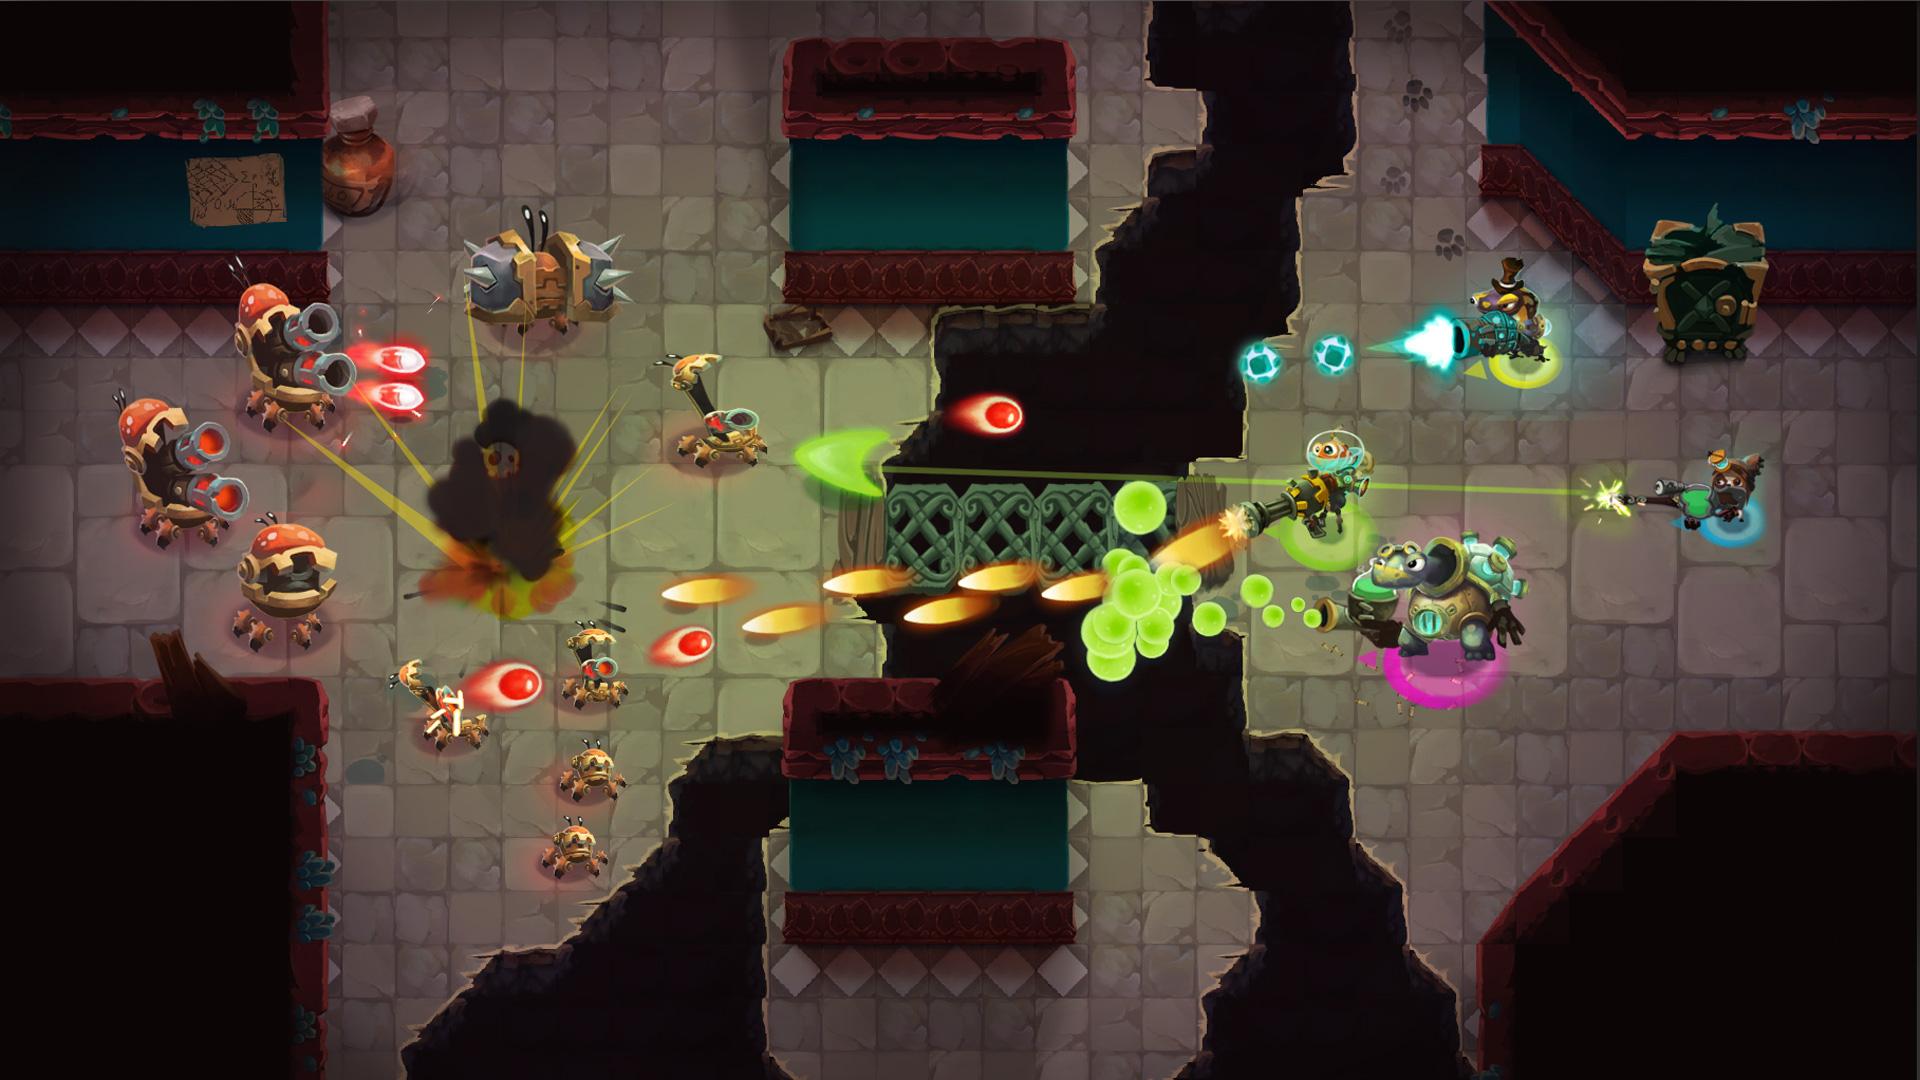 Genetic Disaster gets full release on Steam